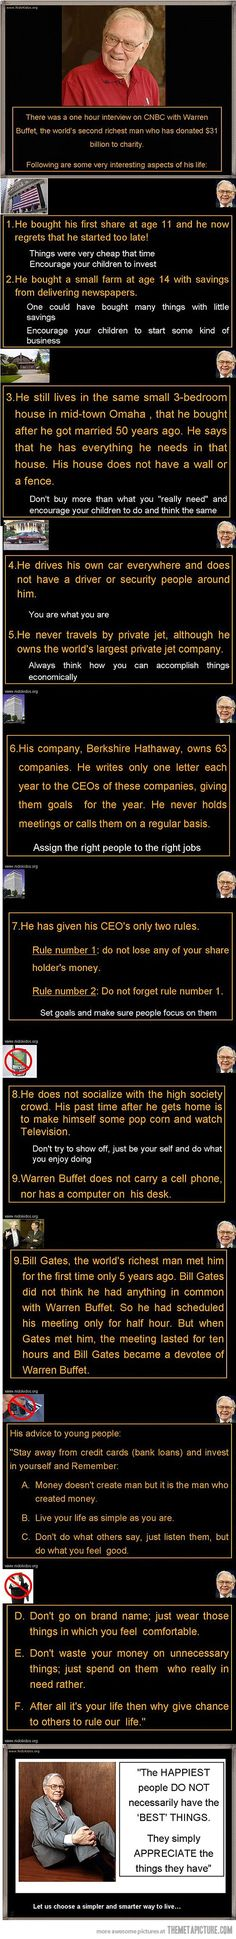 Money Talks... http://www.ifmoneycouldtalk.com